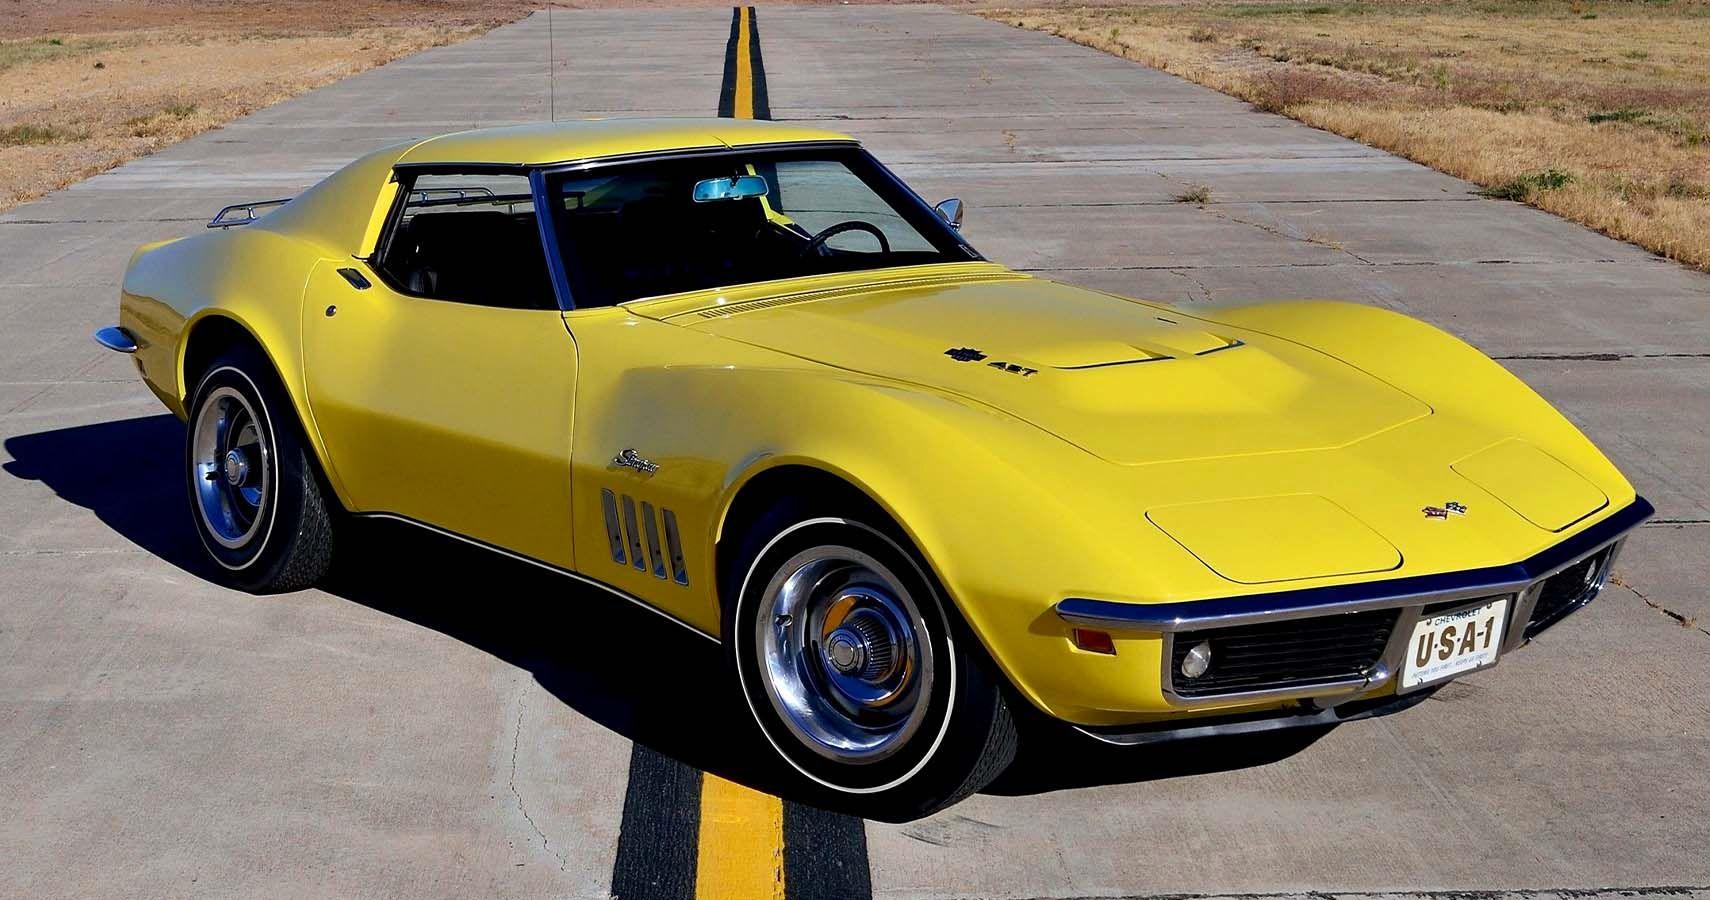 Kekurangan Corvette 69 Harga